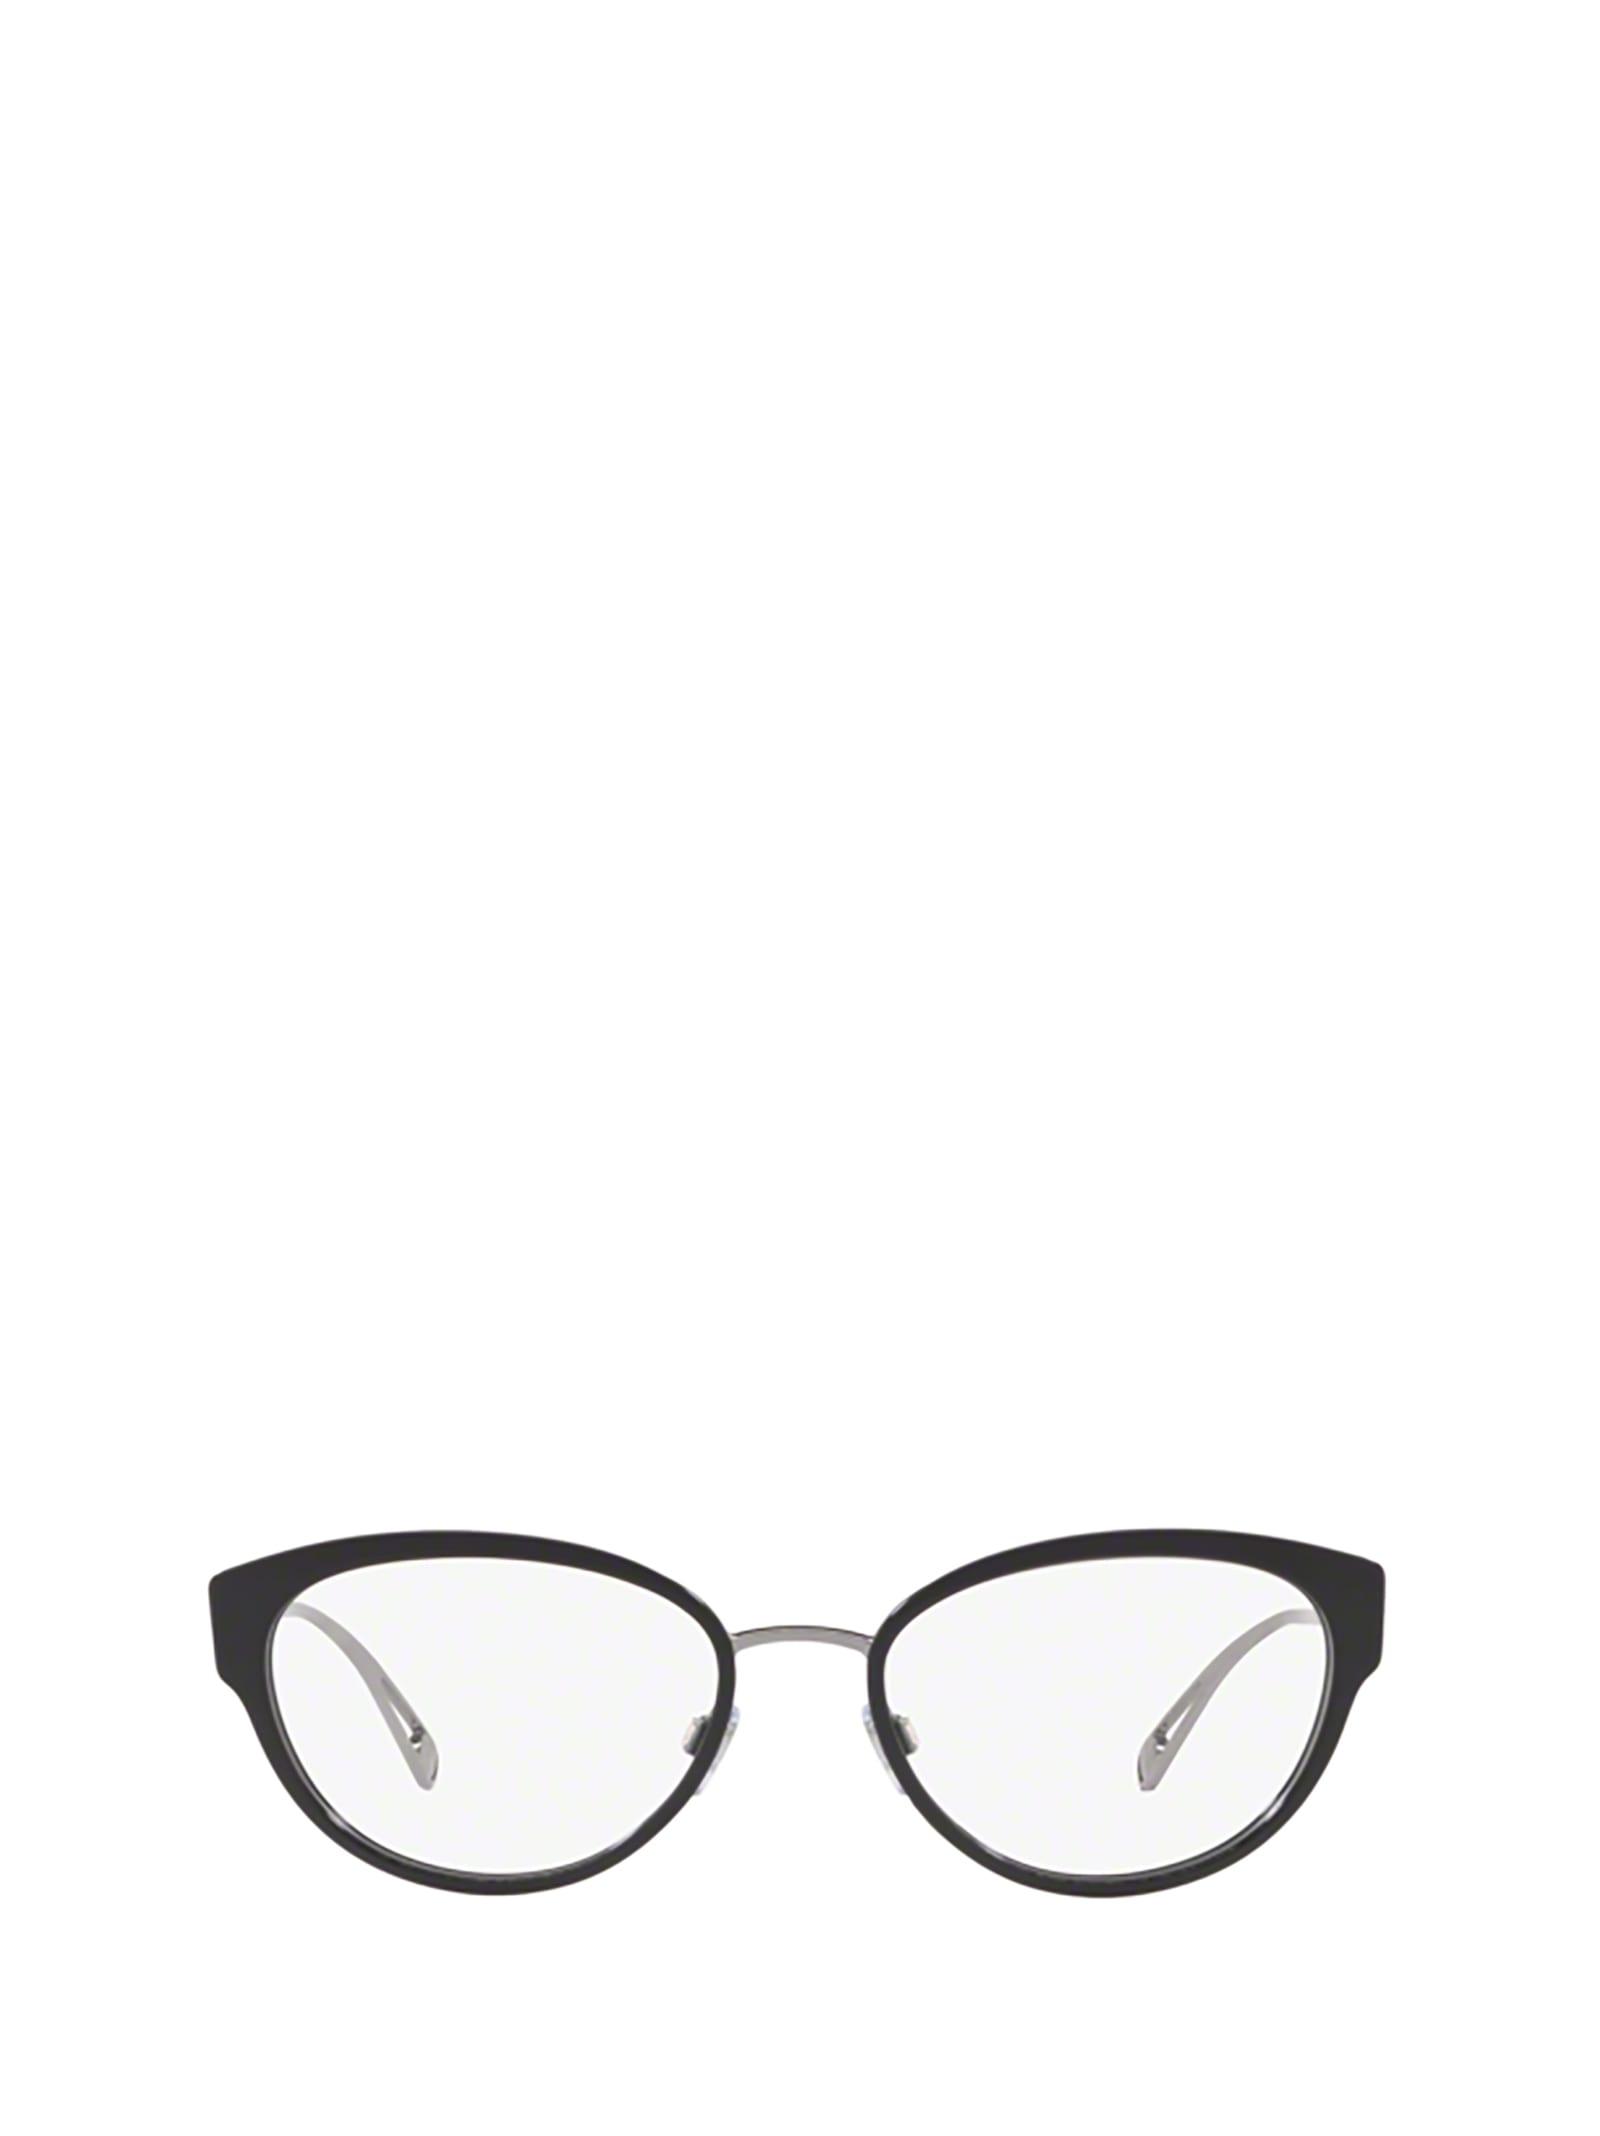 Giorgio Armani Giorgio Armani Ar5090 Black Glasses